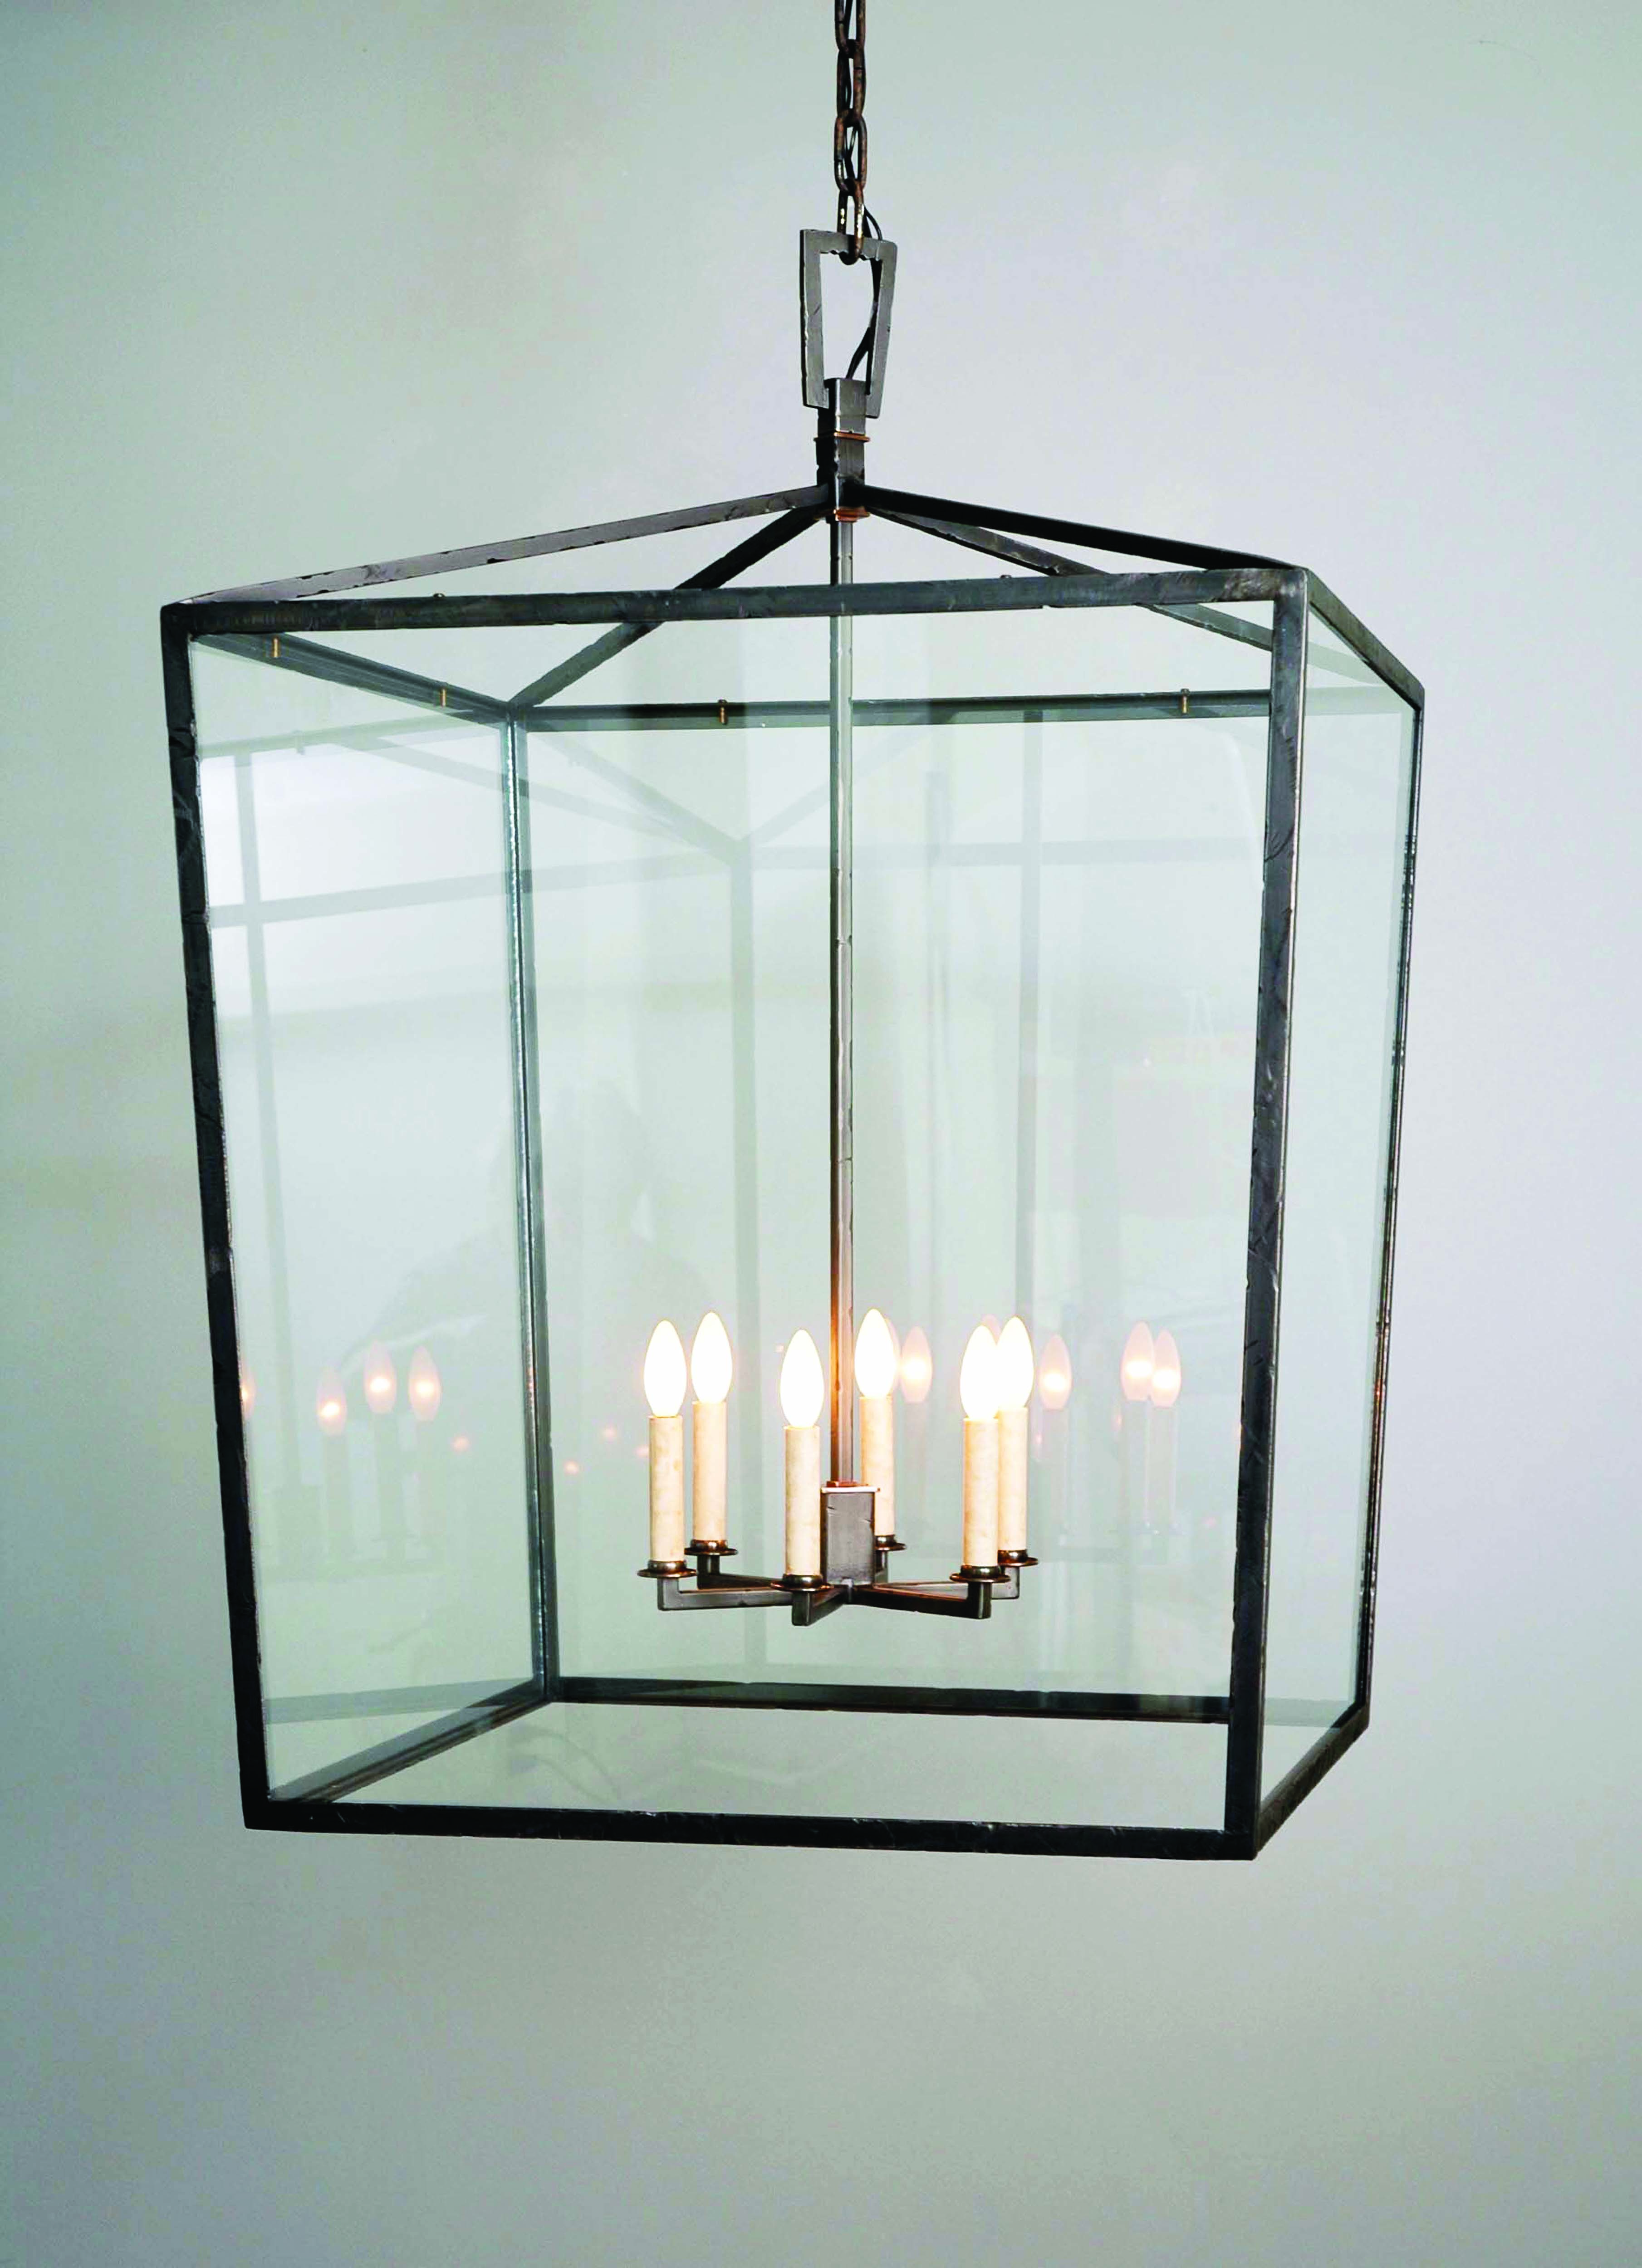 Square Box Cage Lantern - Model No. H1340H | Copper Lantern Lighting